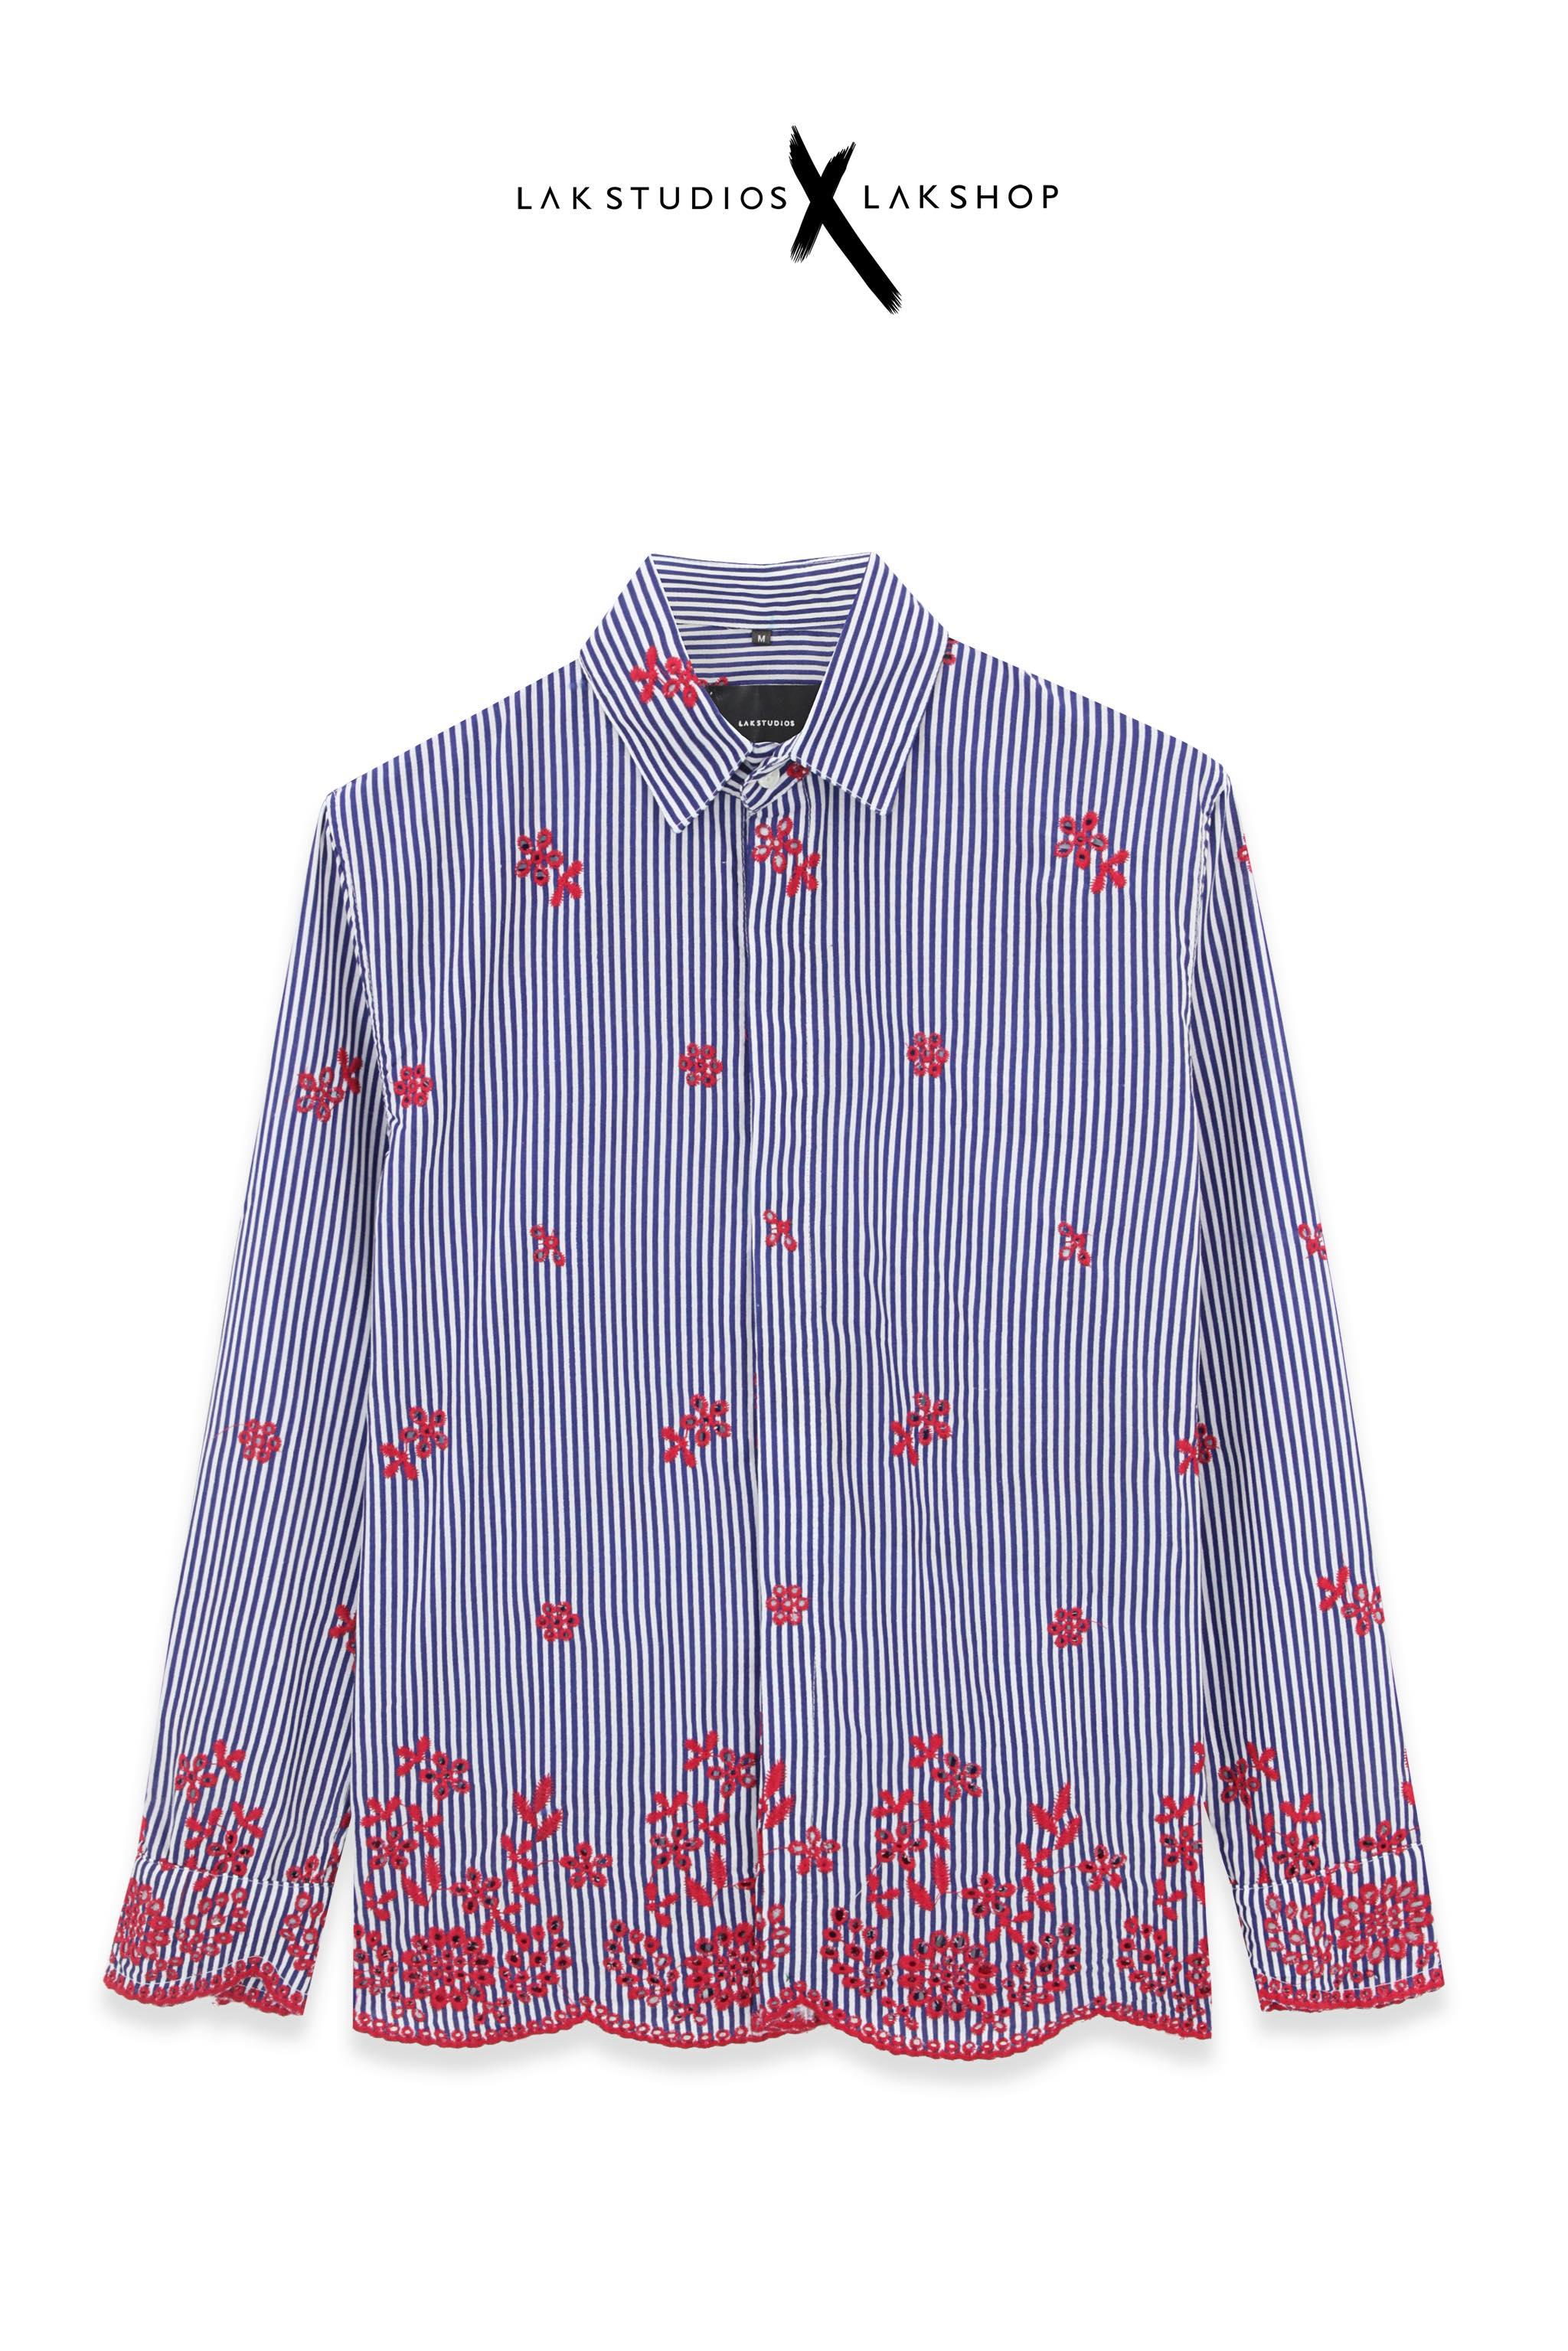 Lak Studios Heart Stripe Short Sleeve Shirt